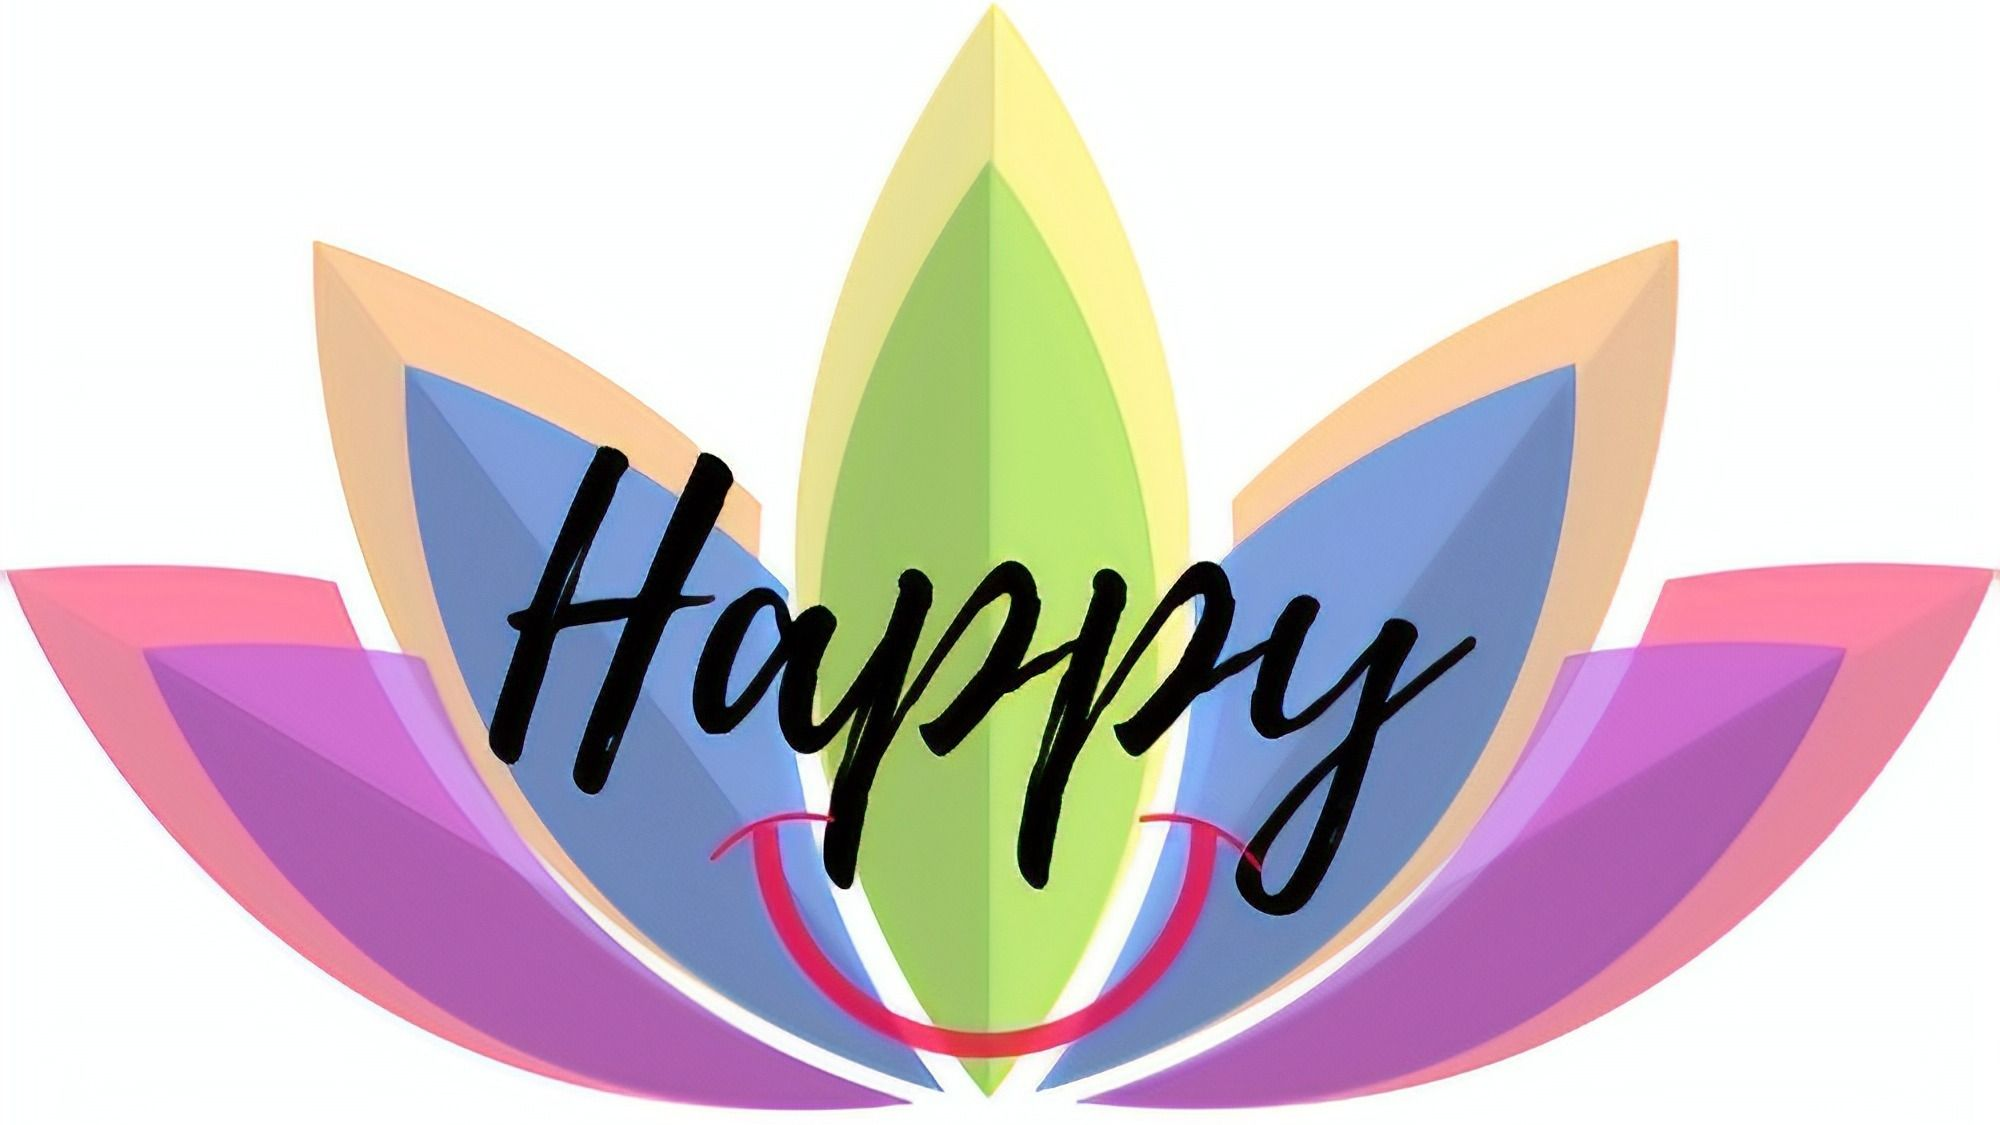 Happy Healing Arts